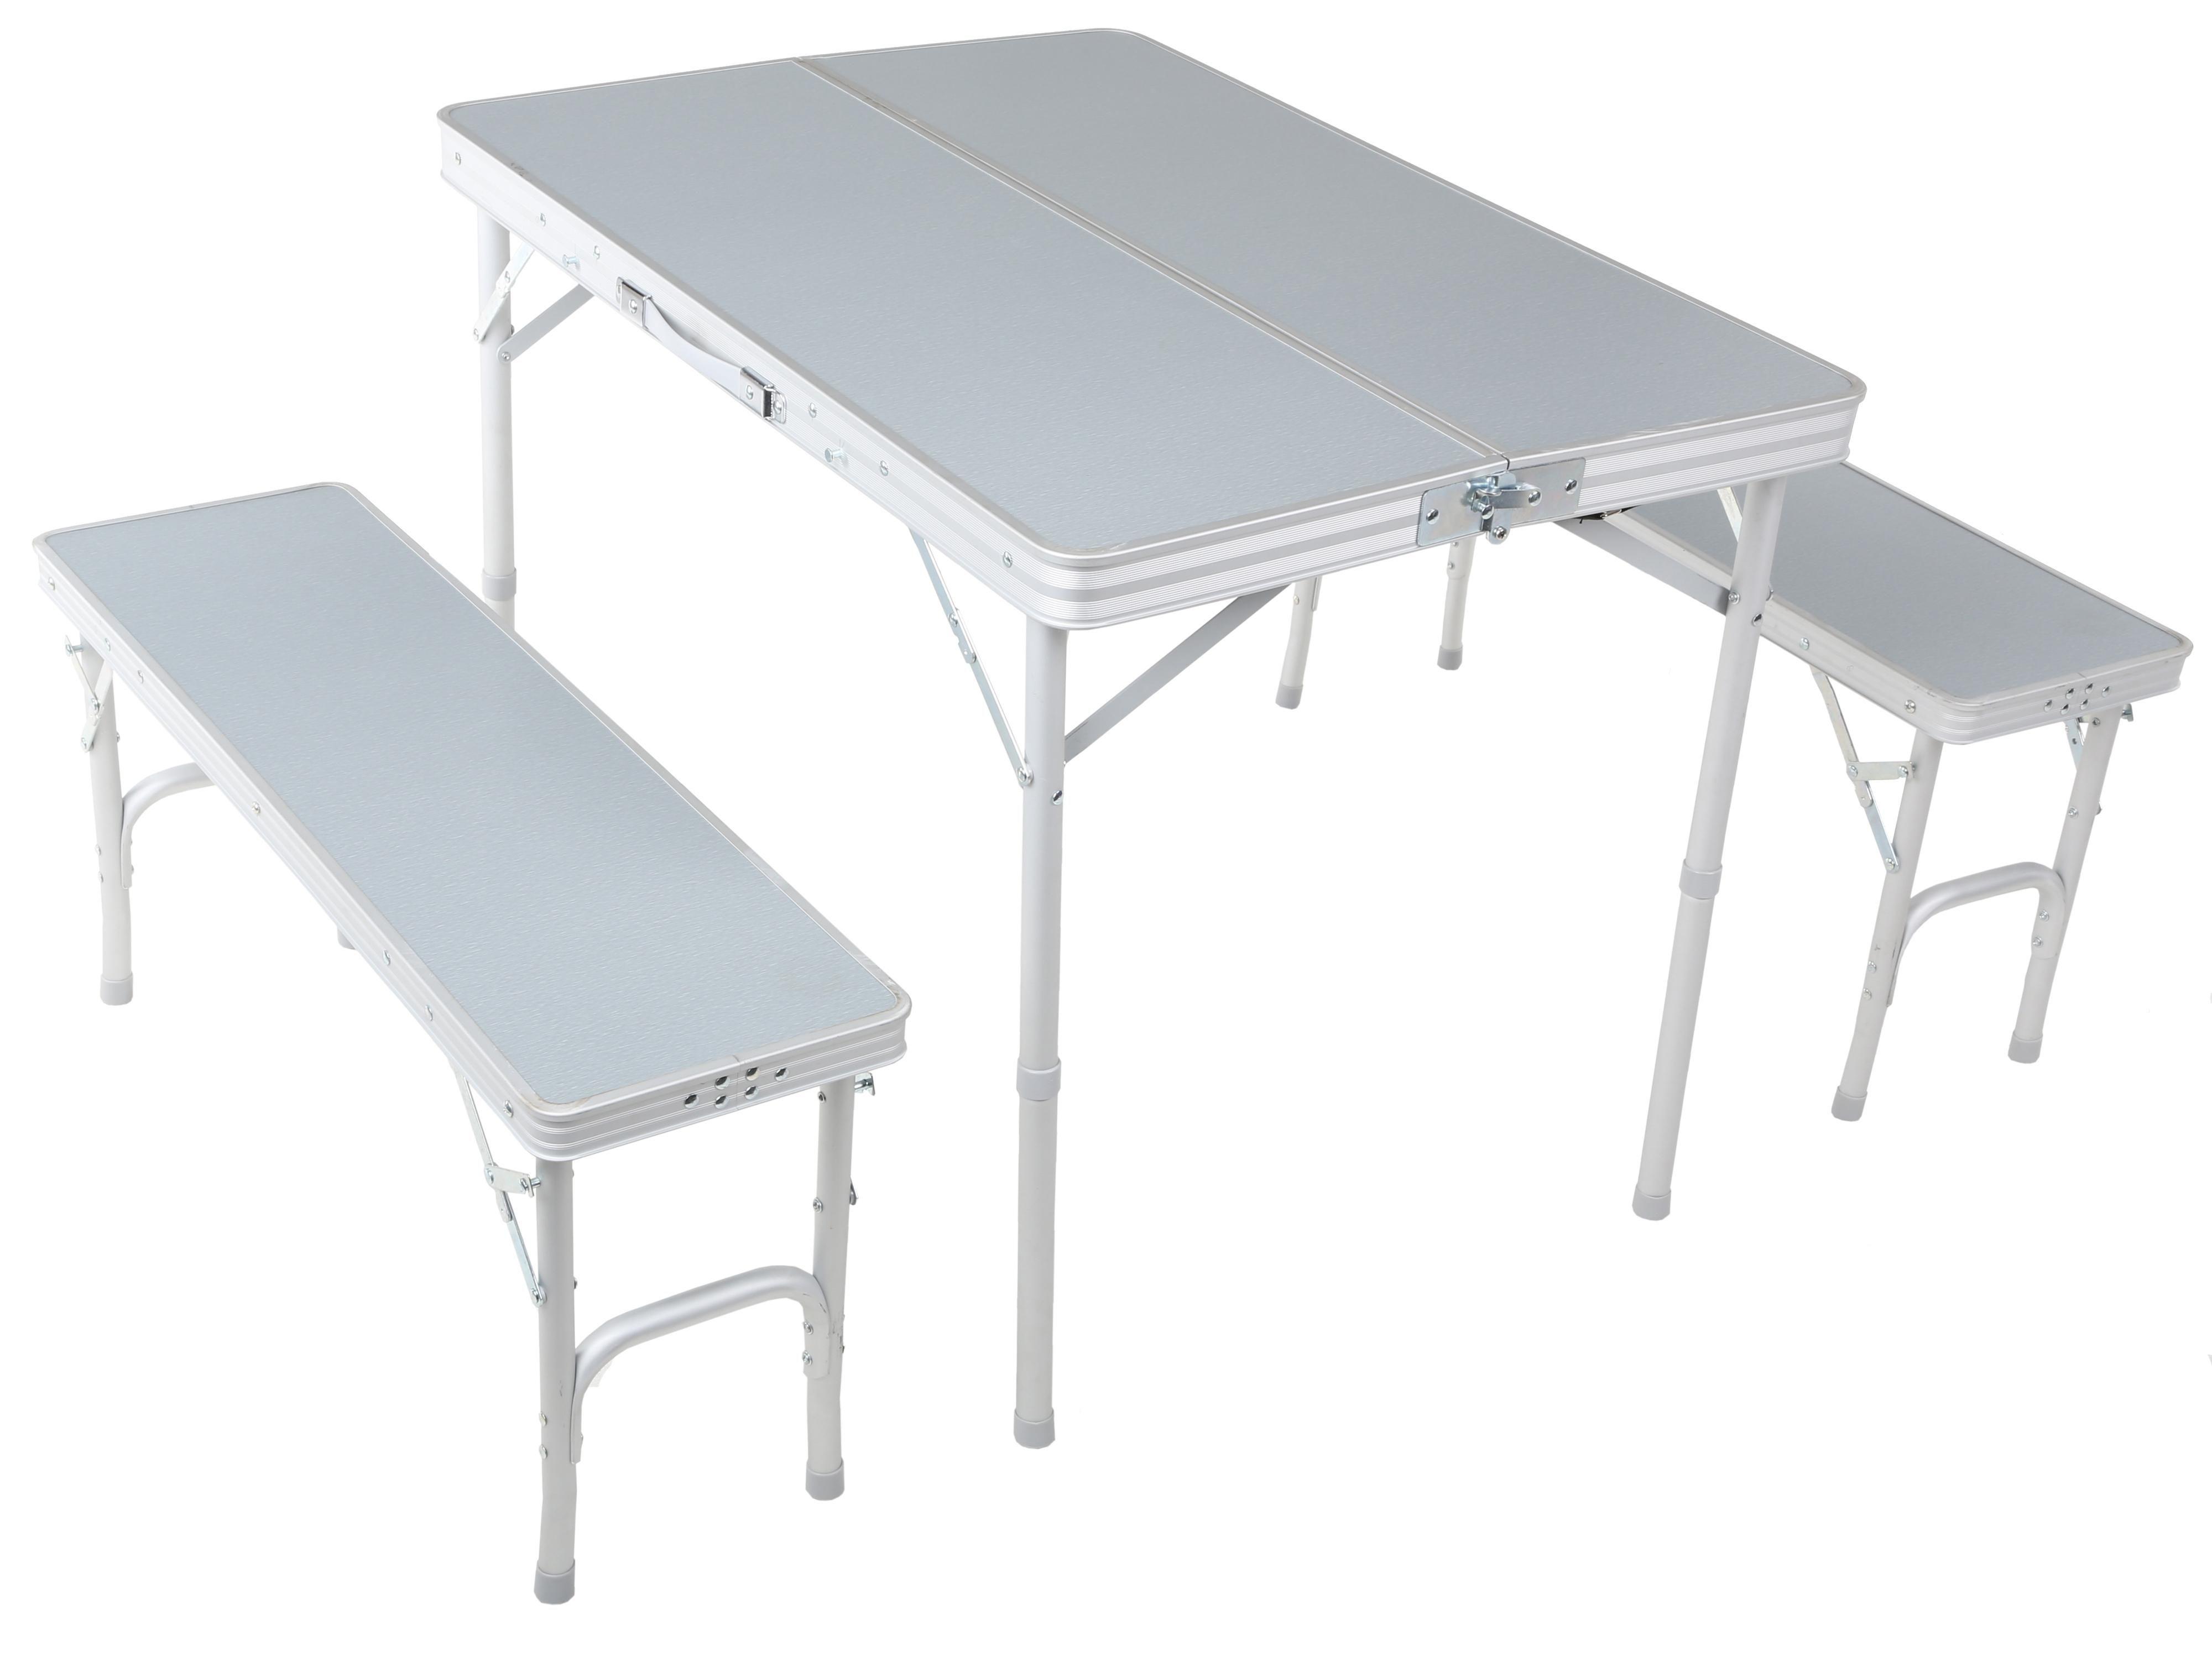 Small Folding Picnic Table And Chairs | http://jeremyeatonart.com ...